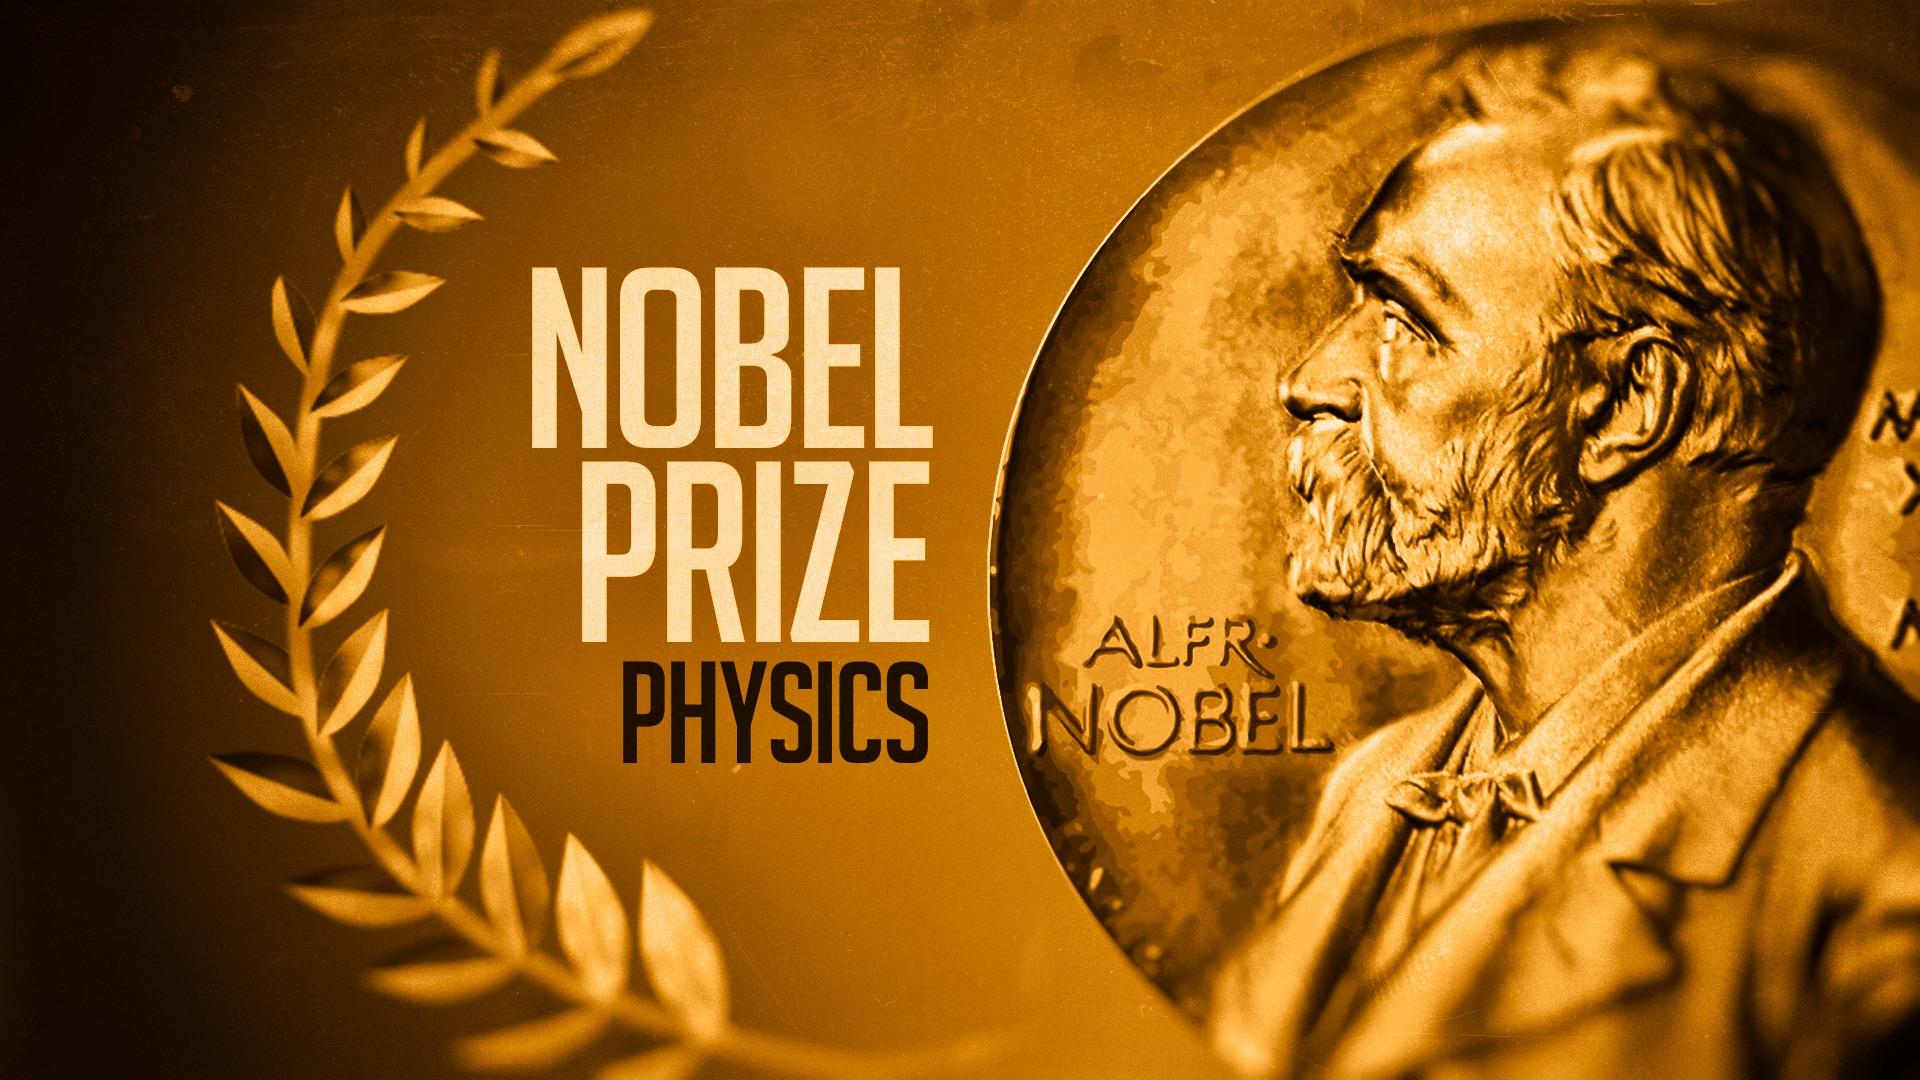 nobel prize physics_421206